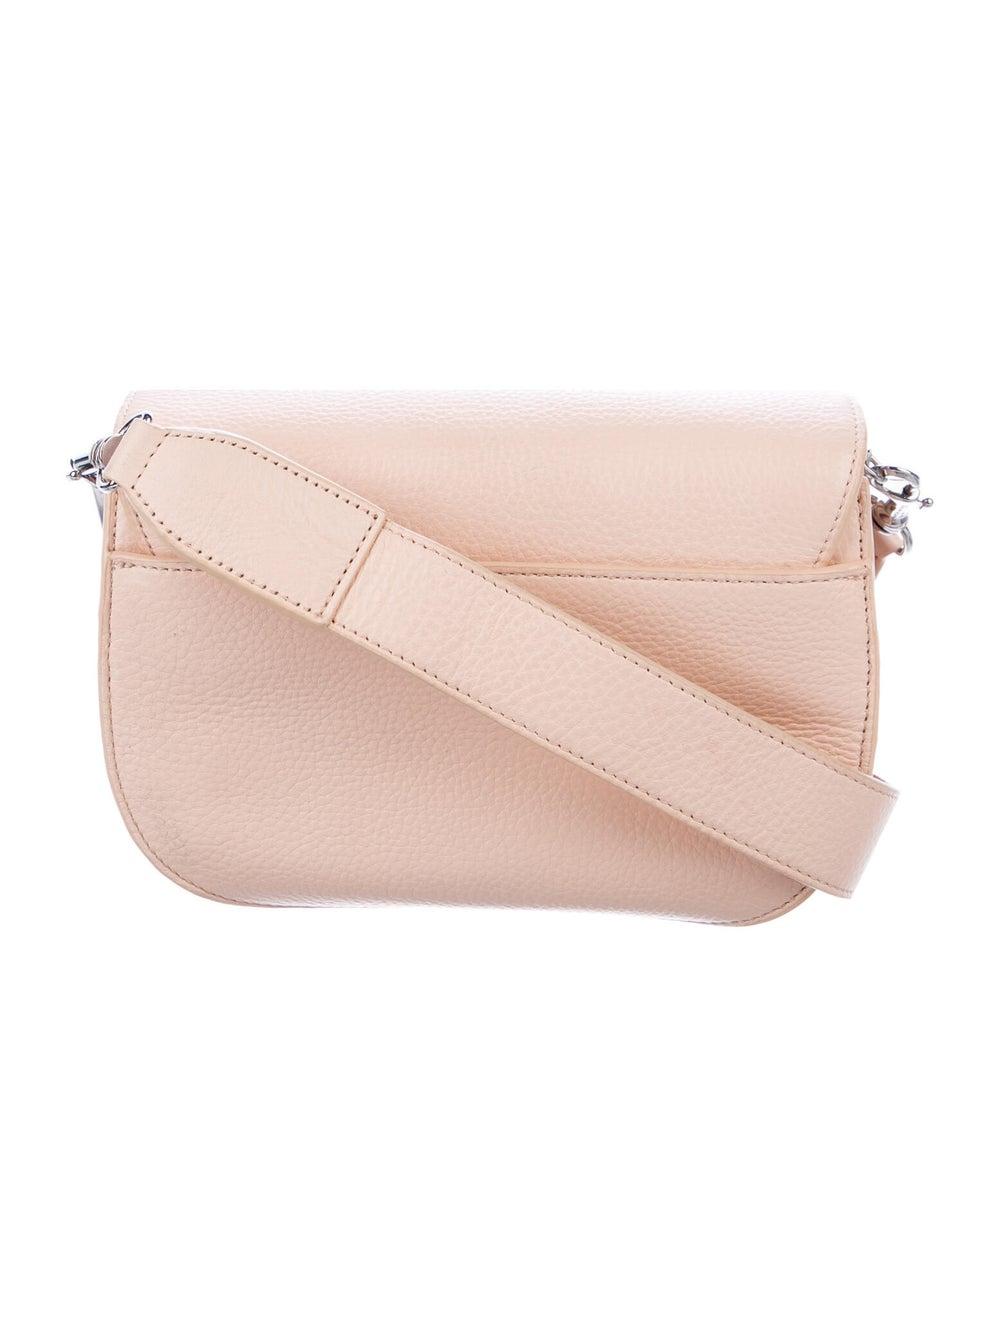 Steven Alan Leather Crossbody Bag Pink - image 4